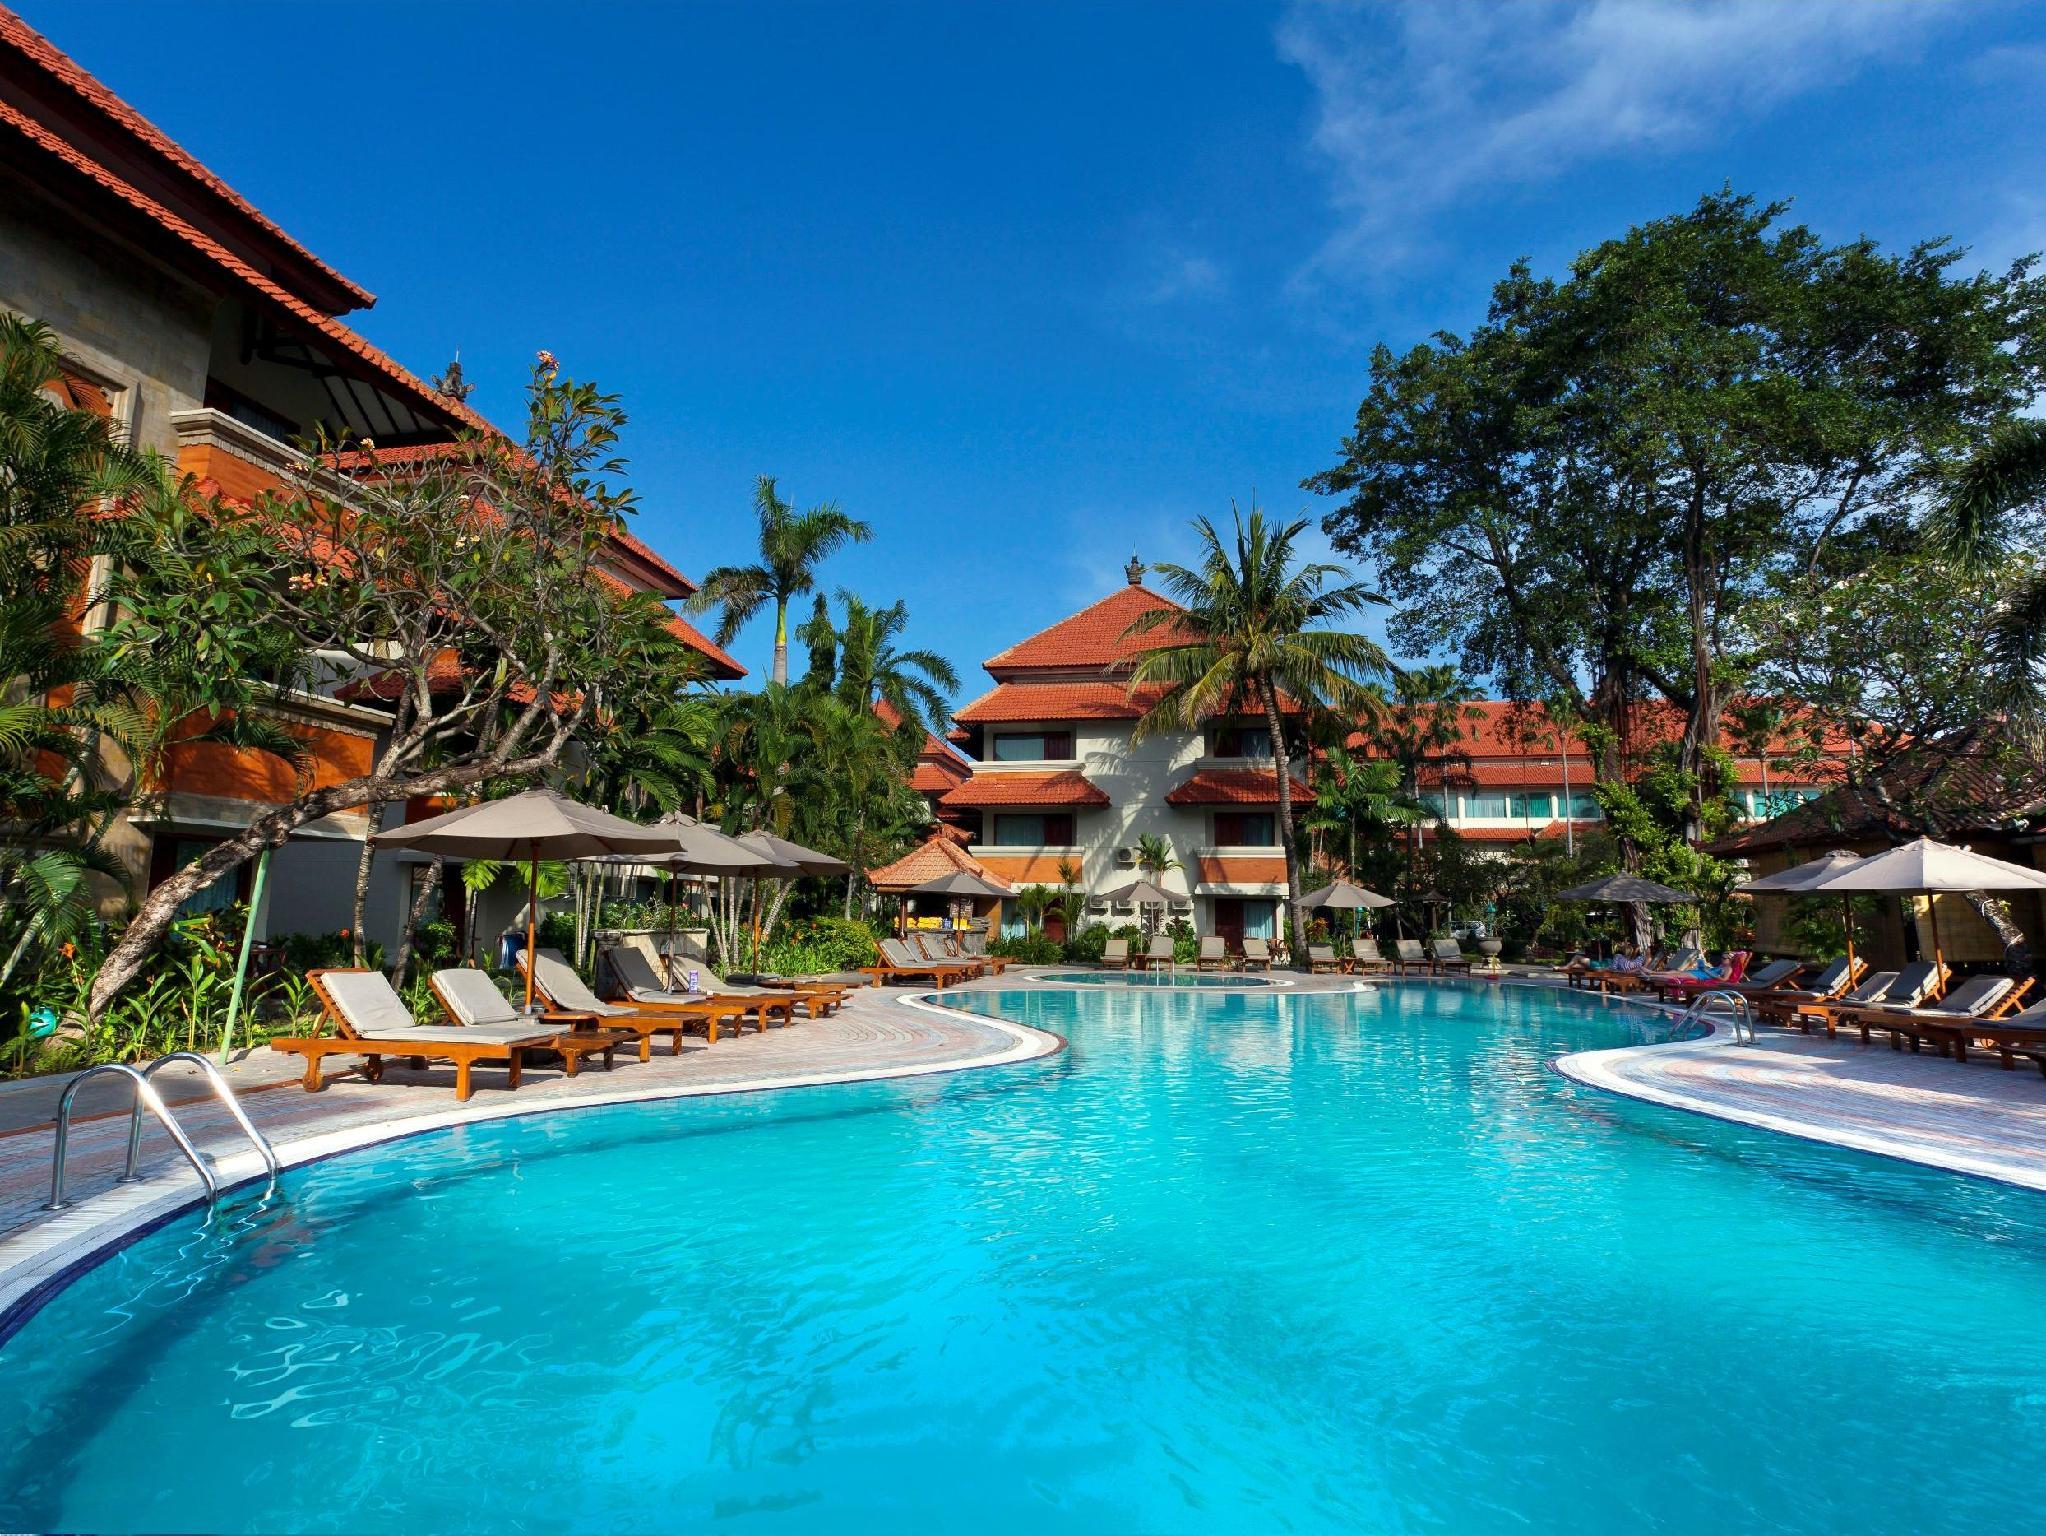 Hotell White Rose Bali Hotels   Villas